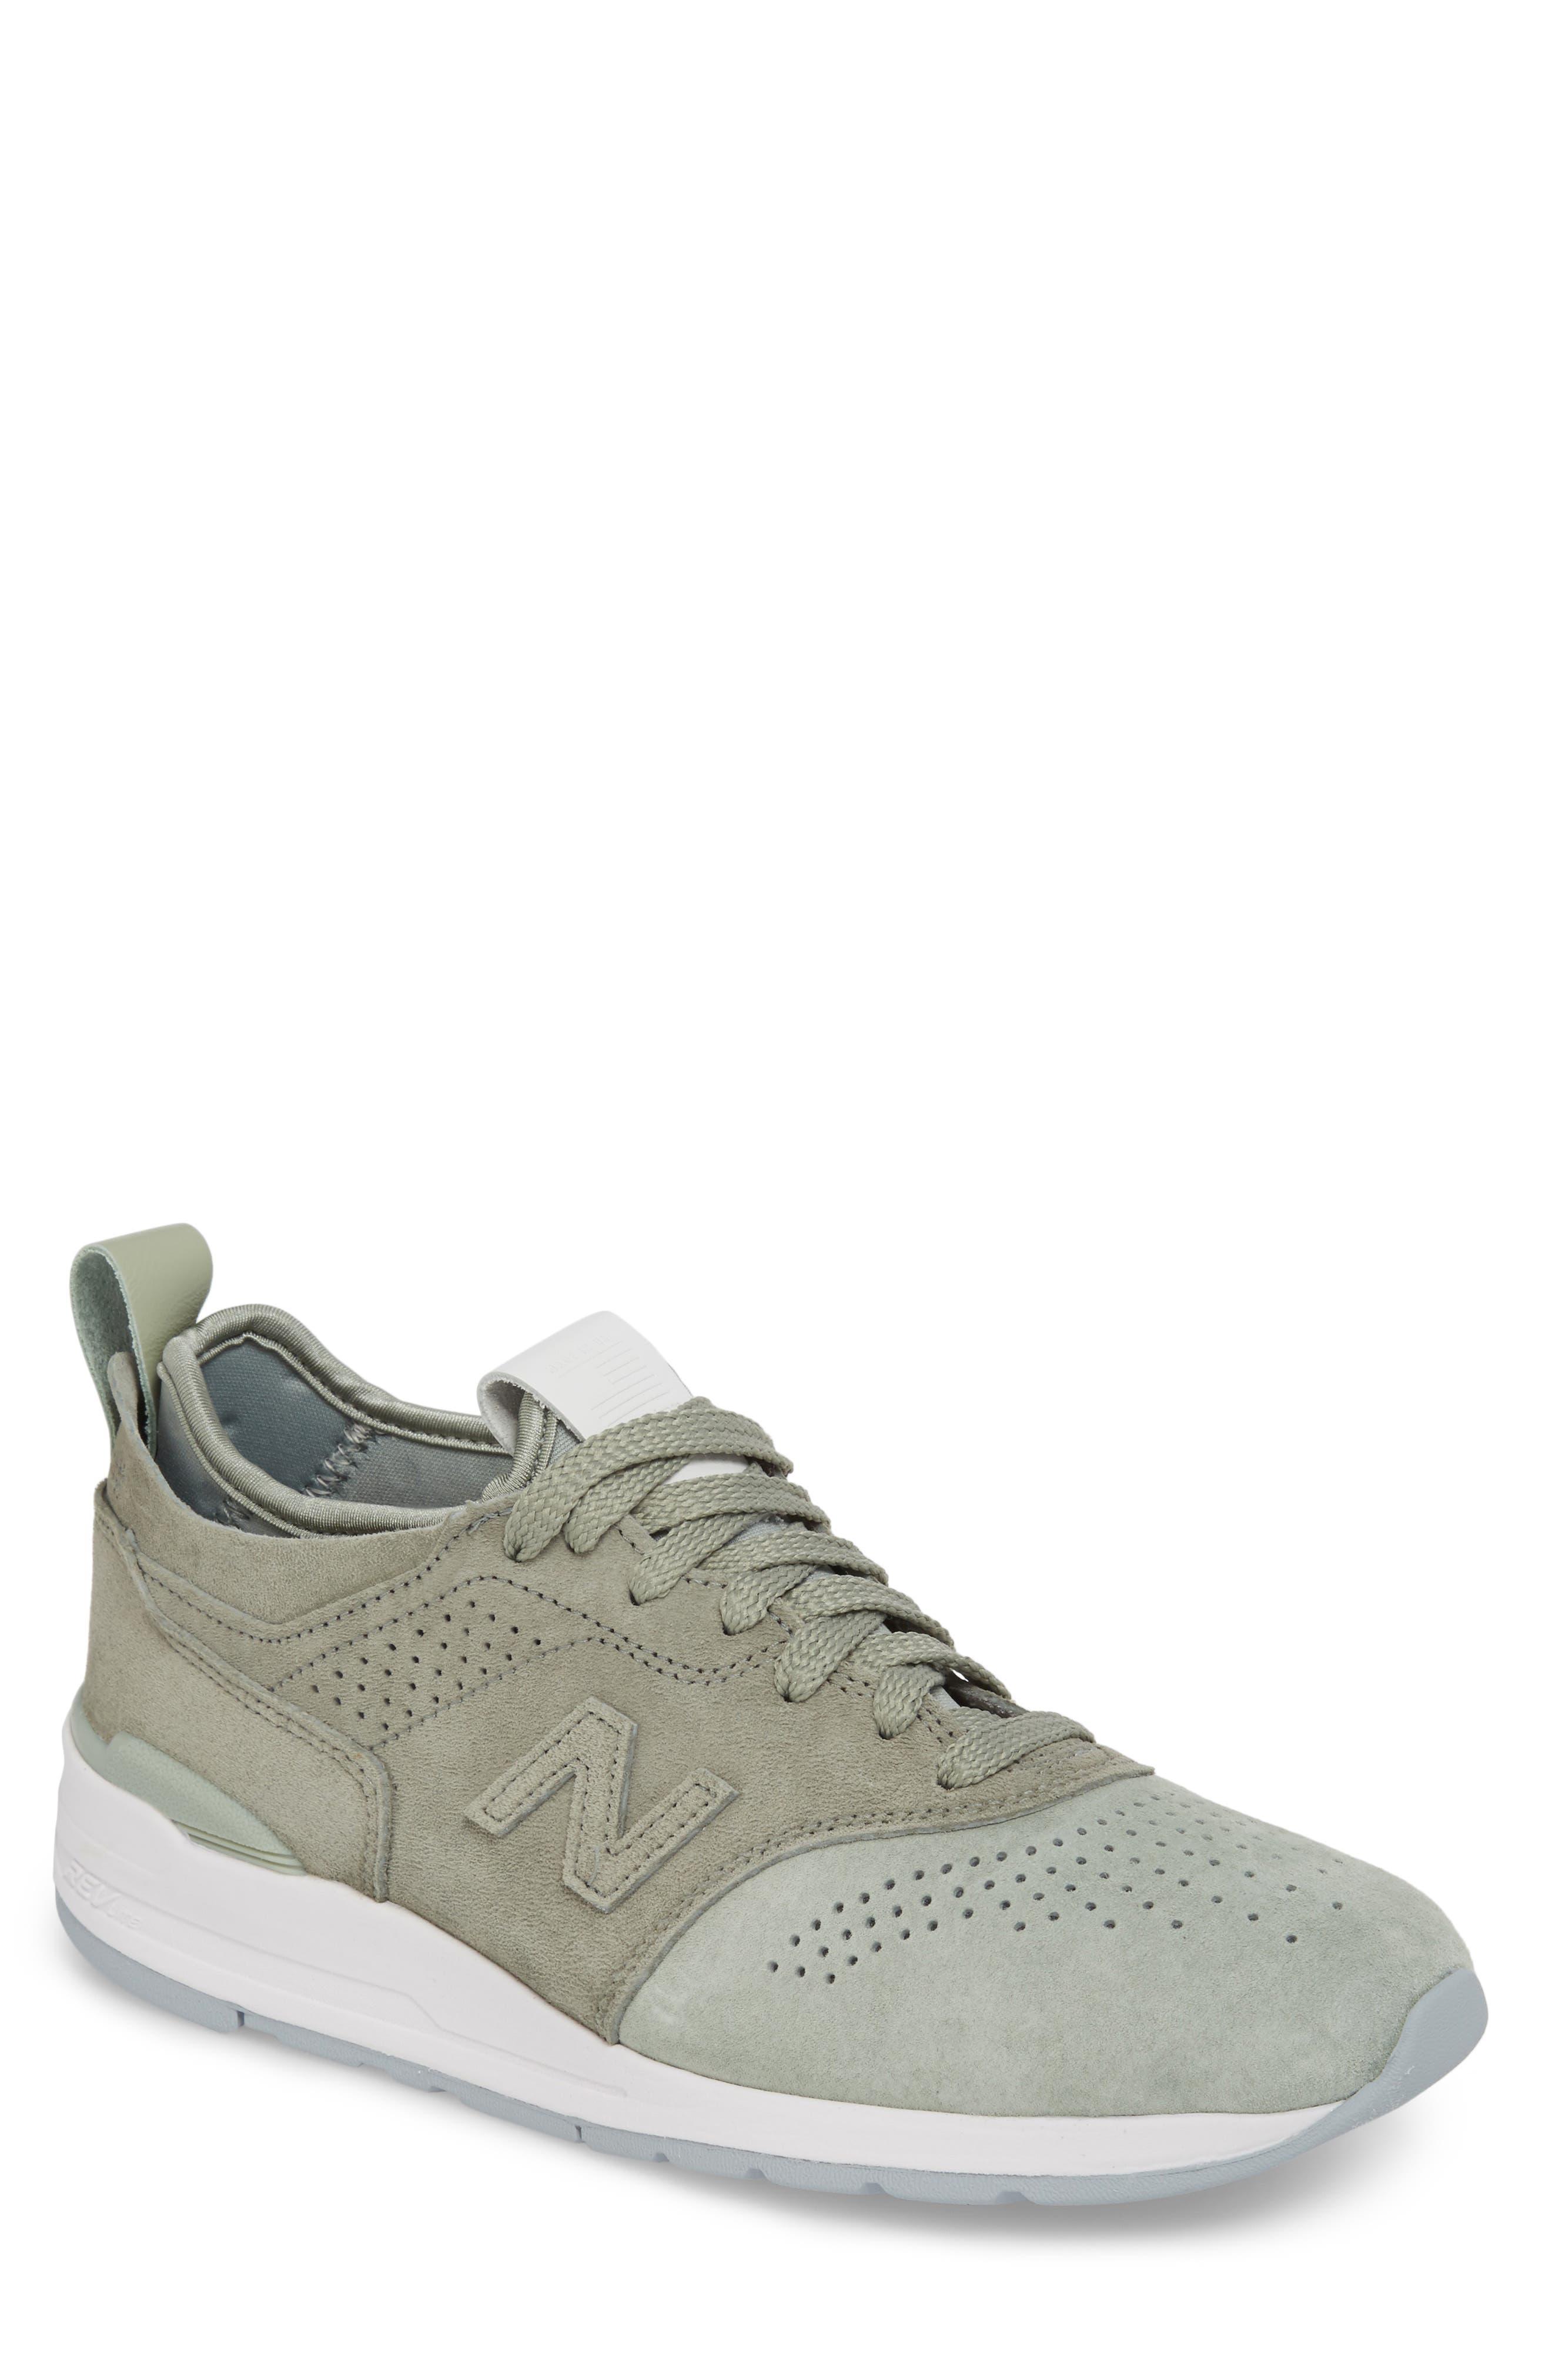 997R Perforated Sneaker,                             Main thumbnail 1, color,                             308